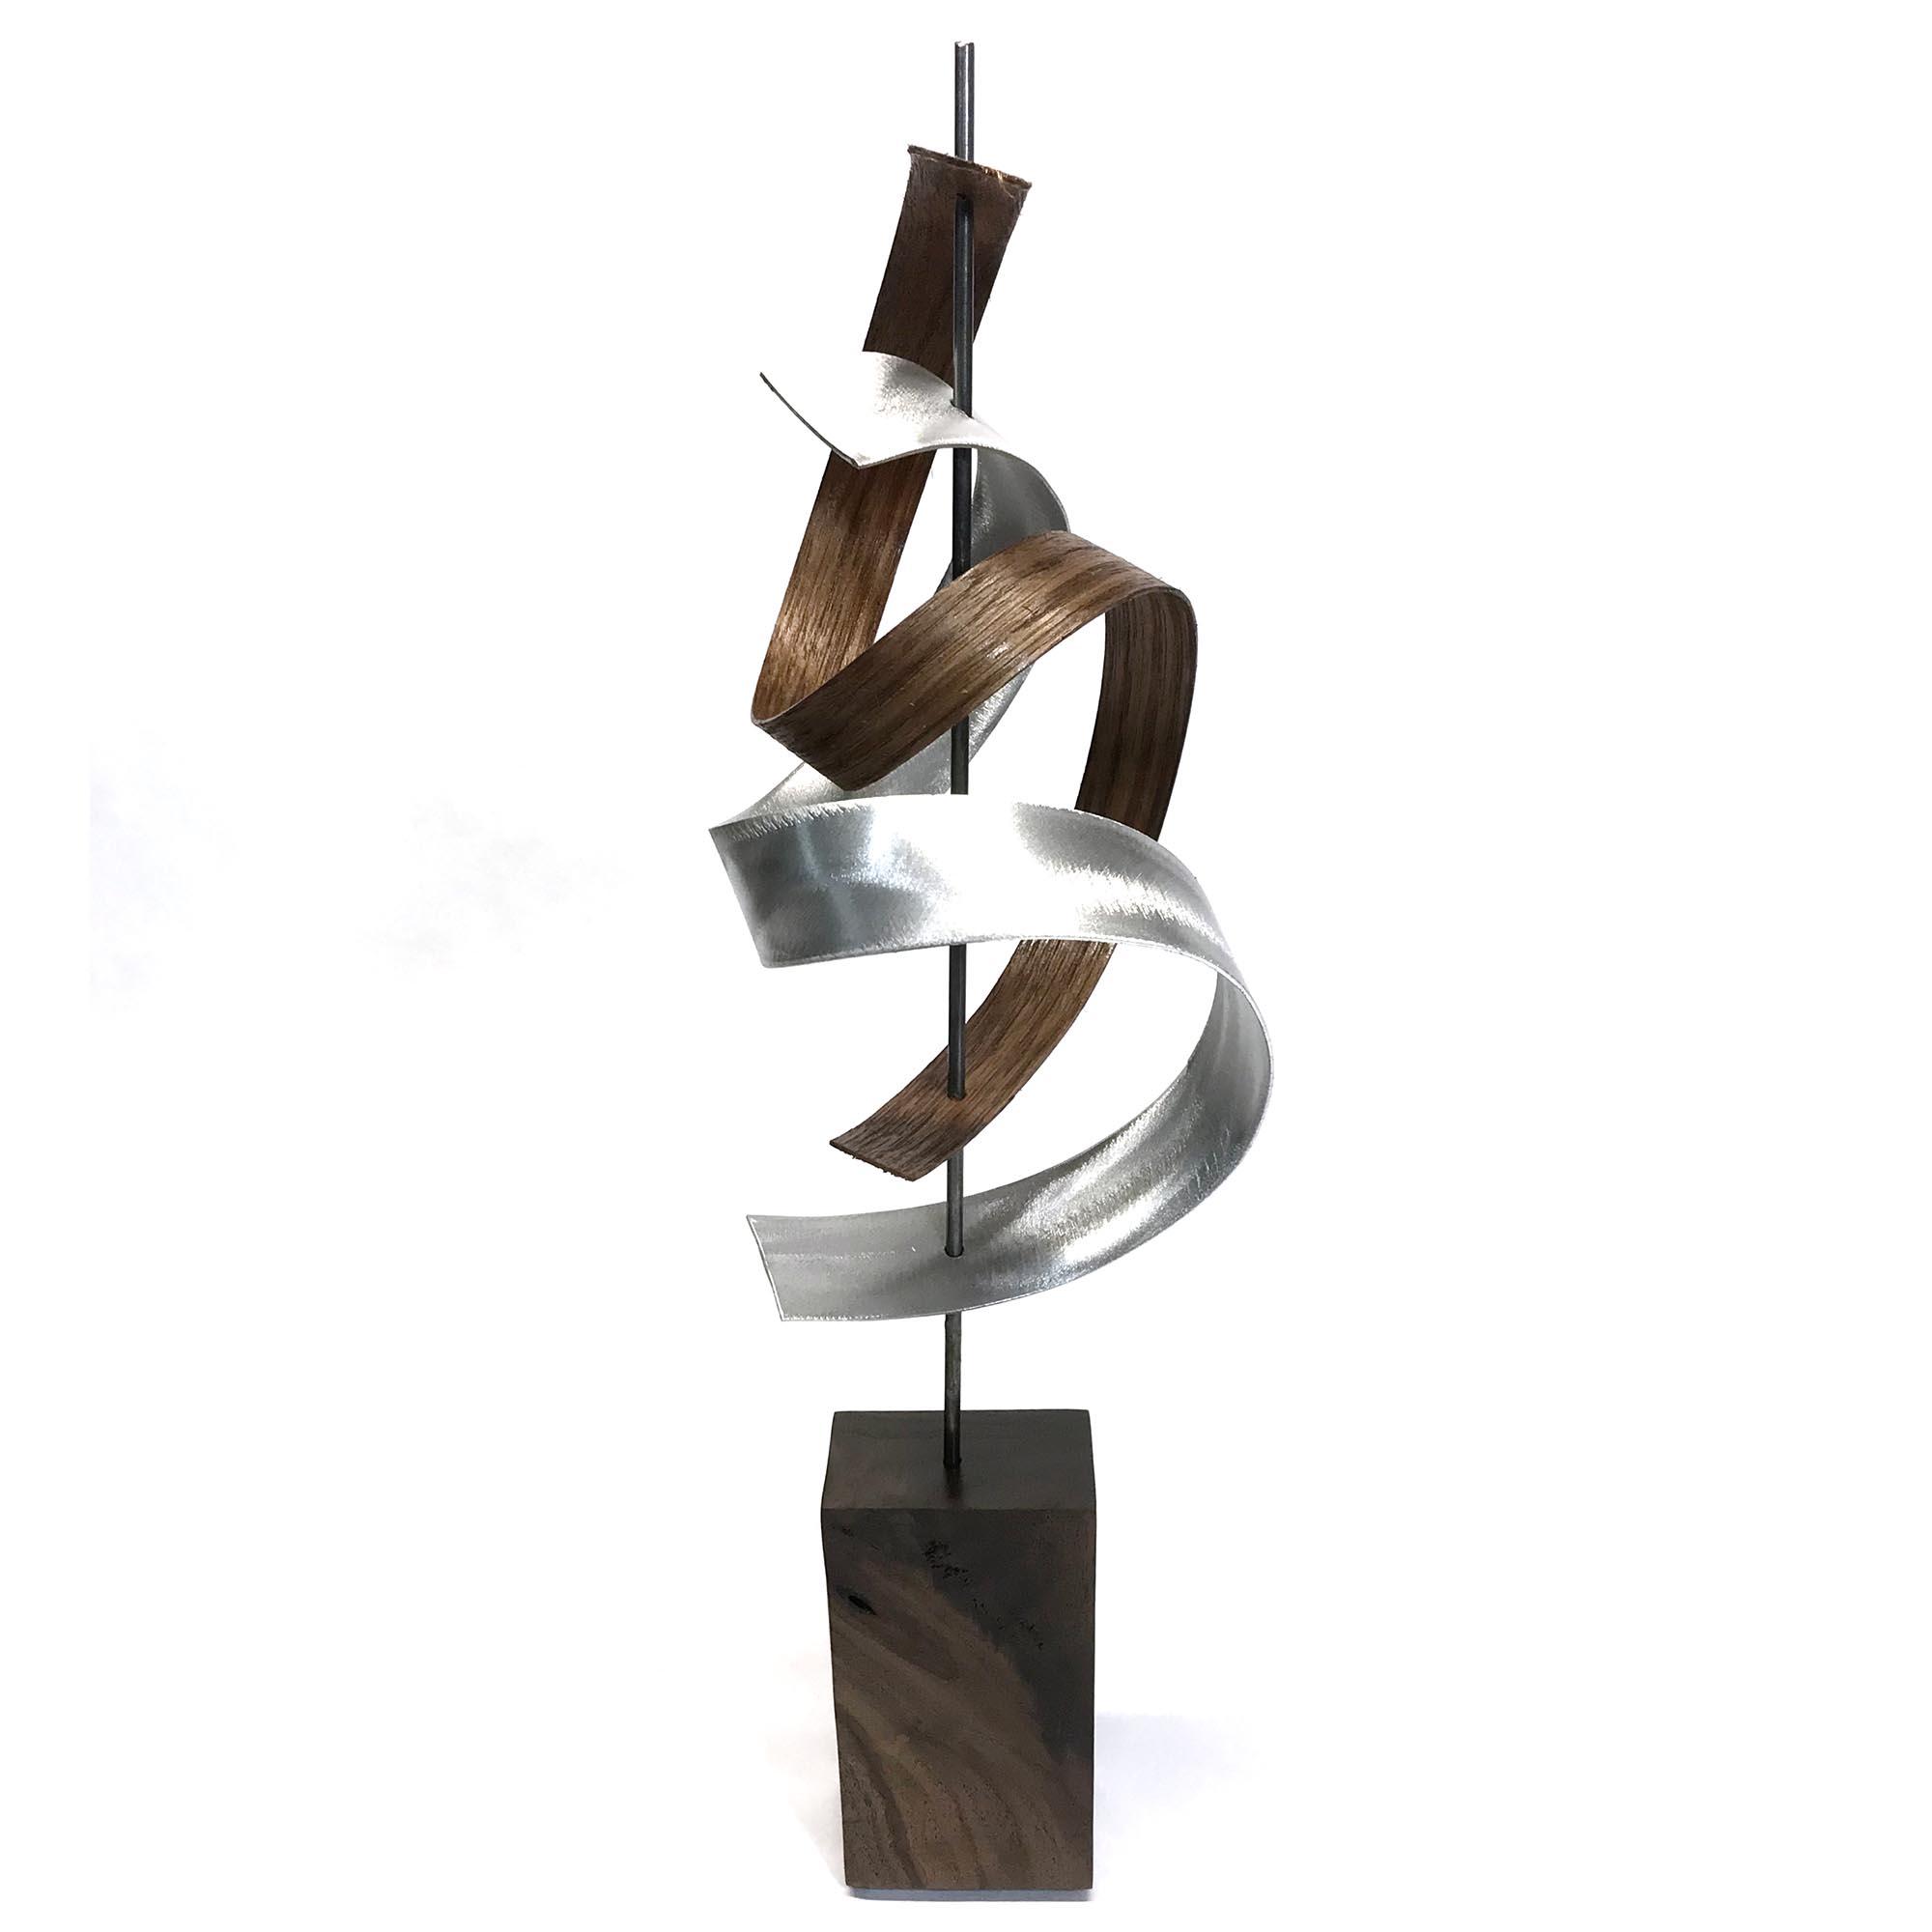 Waltz by Jackson Wright - Modern Wood Sculpture, Mid-Century Home Decor - Image 2